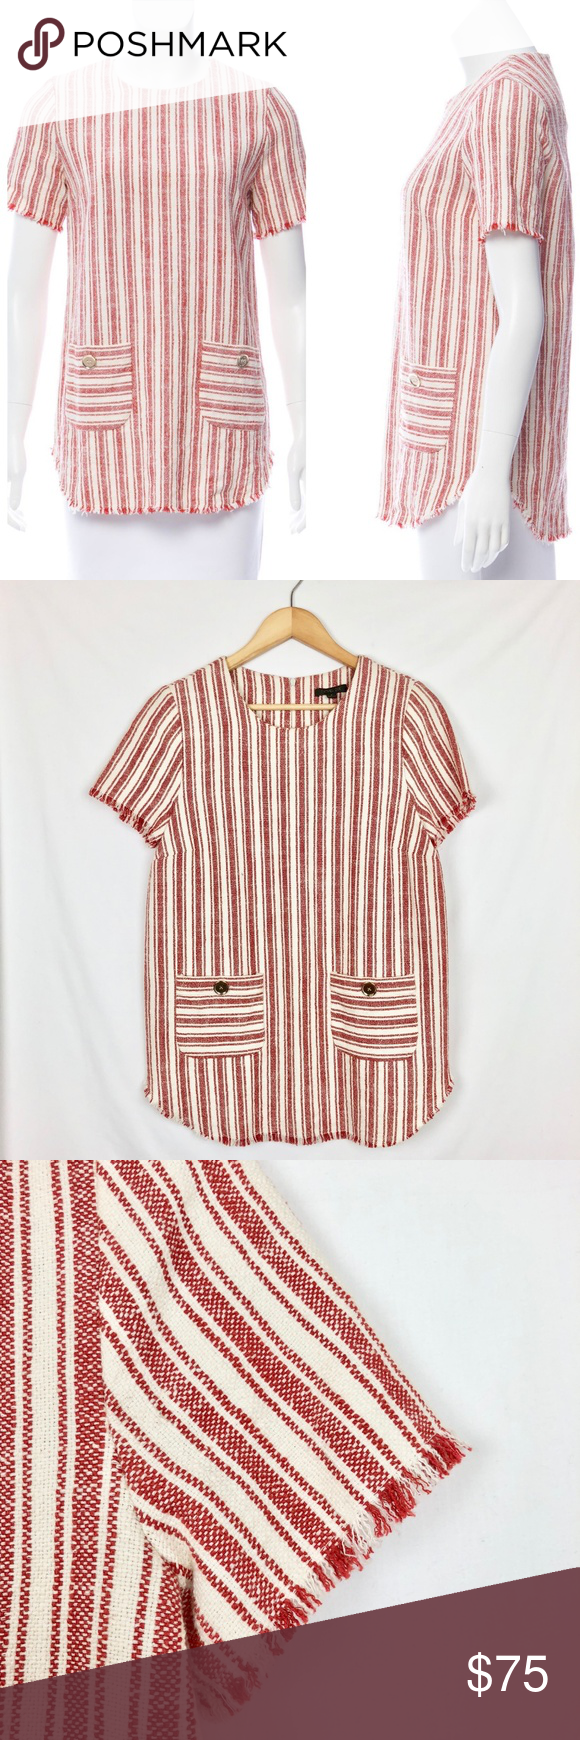 Rachel zoe striped short sleeved top sz my posh closet